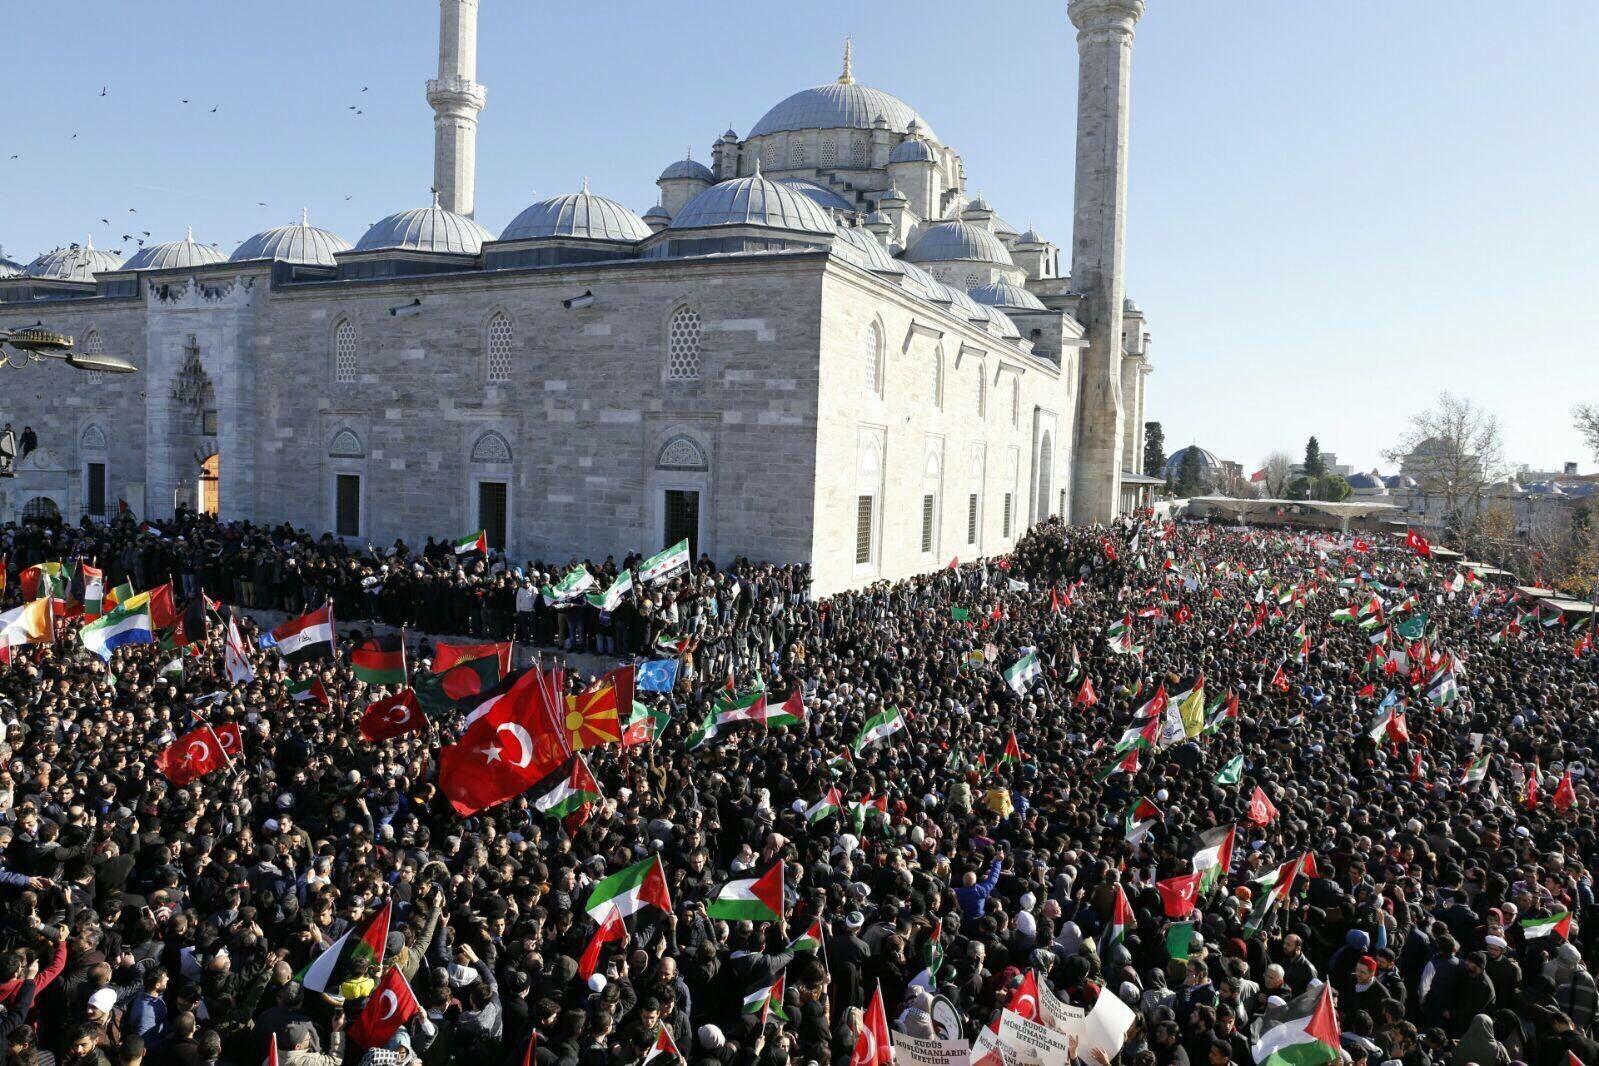 У мечети «Фатиха» в Стамбуле